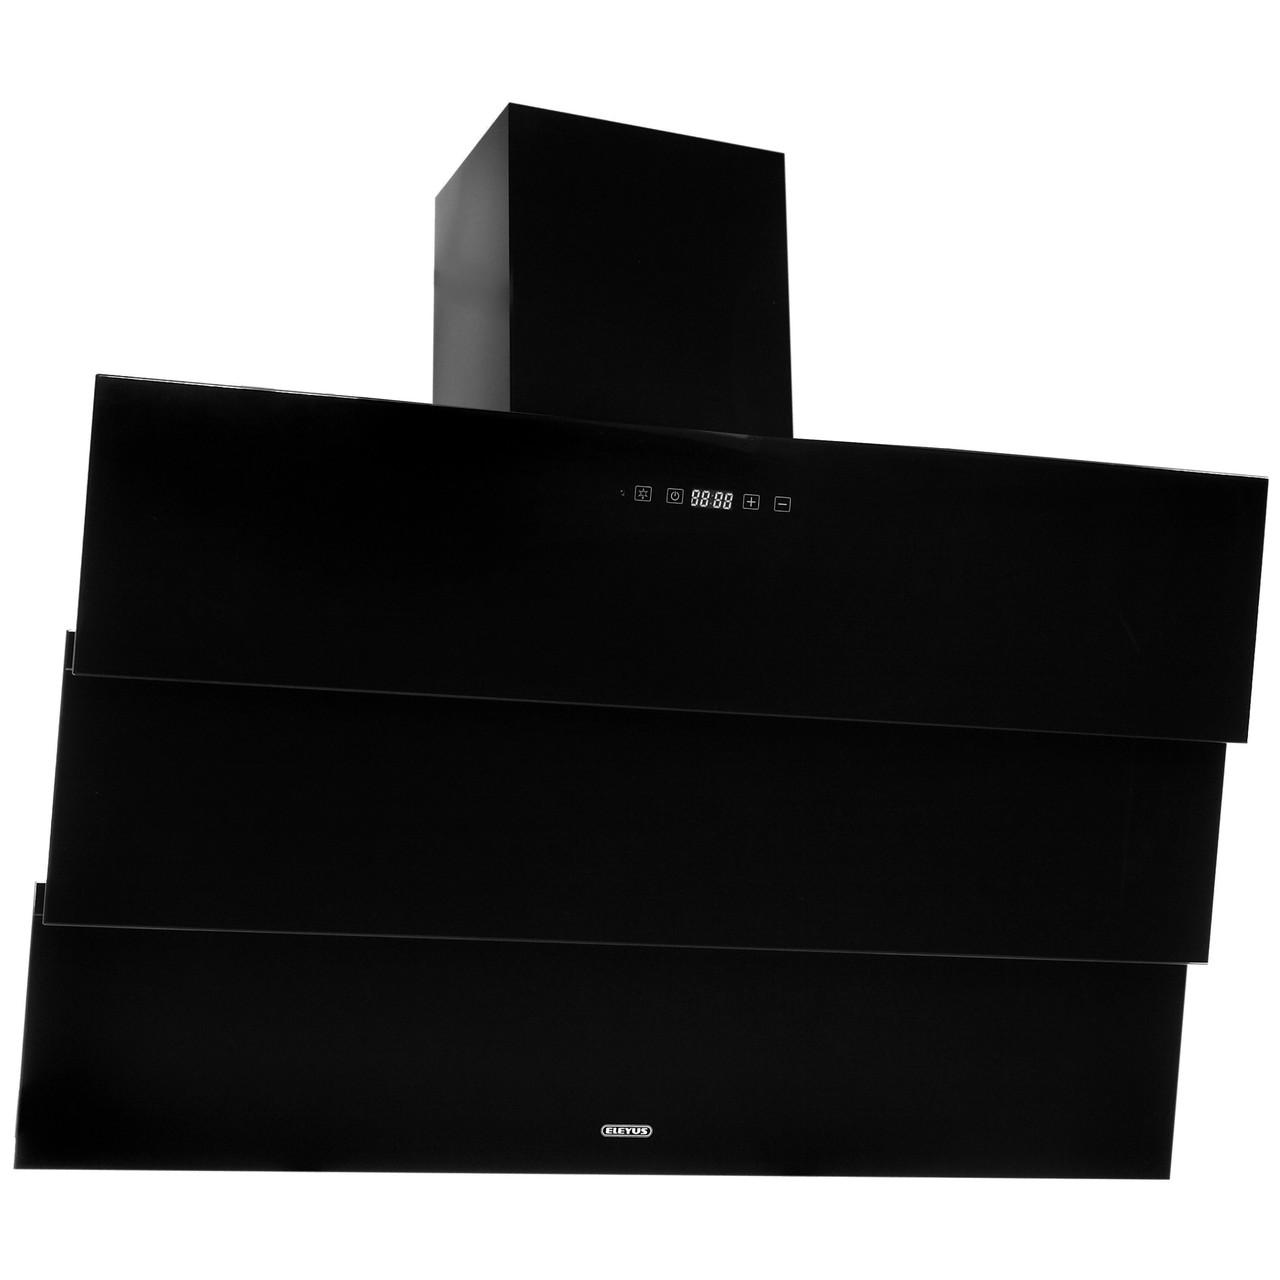 Витяжка кухонна вертикальна ELEYUS Troy 1000 LED SMD 90 BL + Безкоштовна доставка!